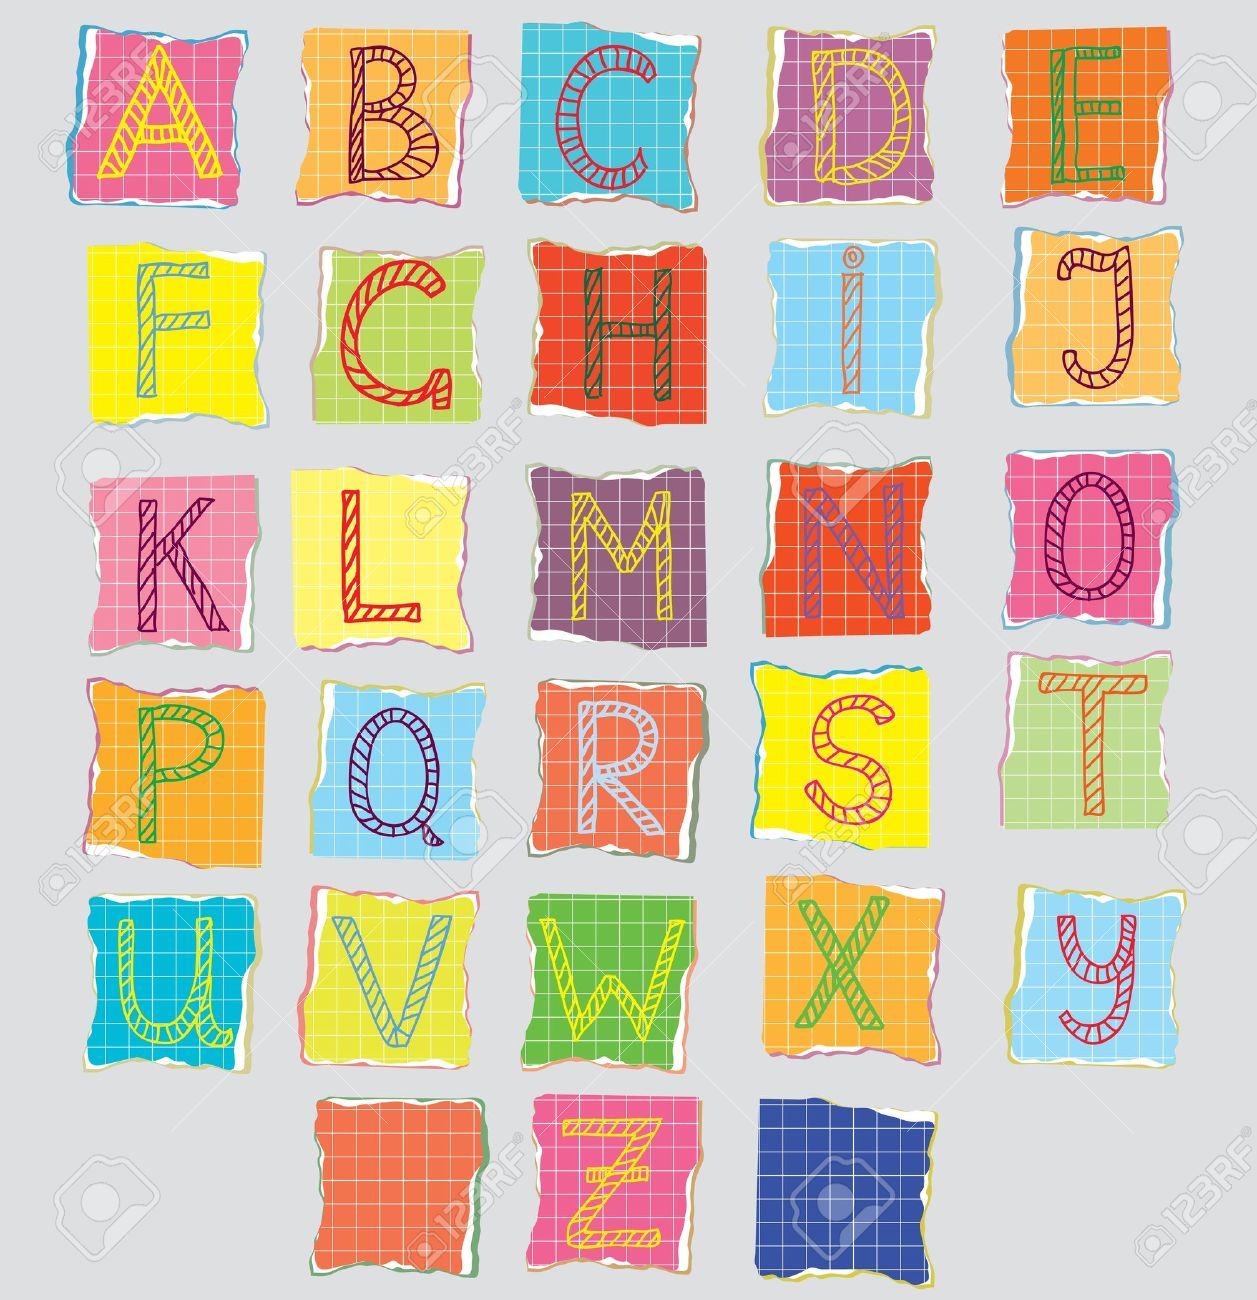 color alphabet for children cartoon stock vector 10710616